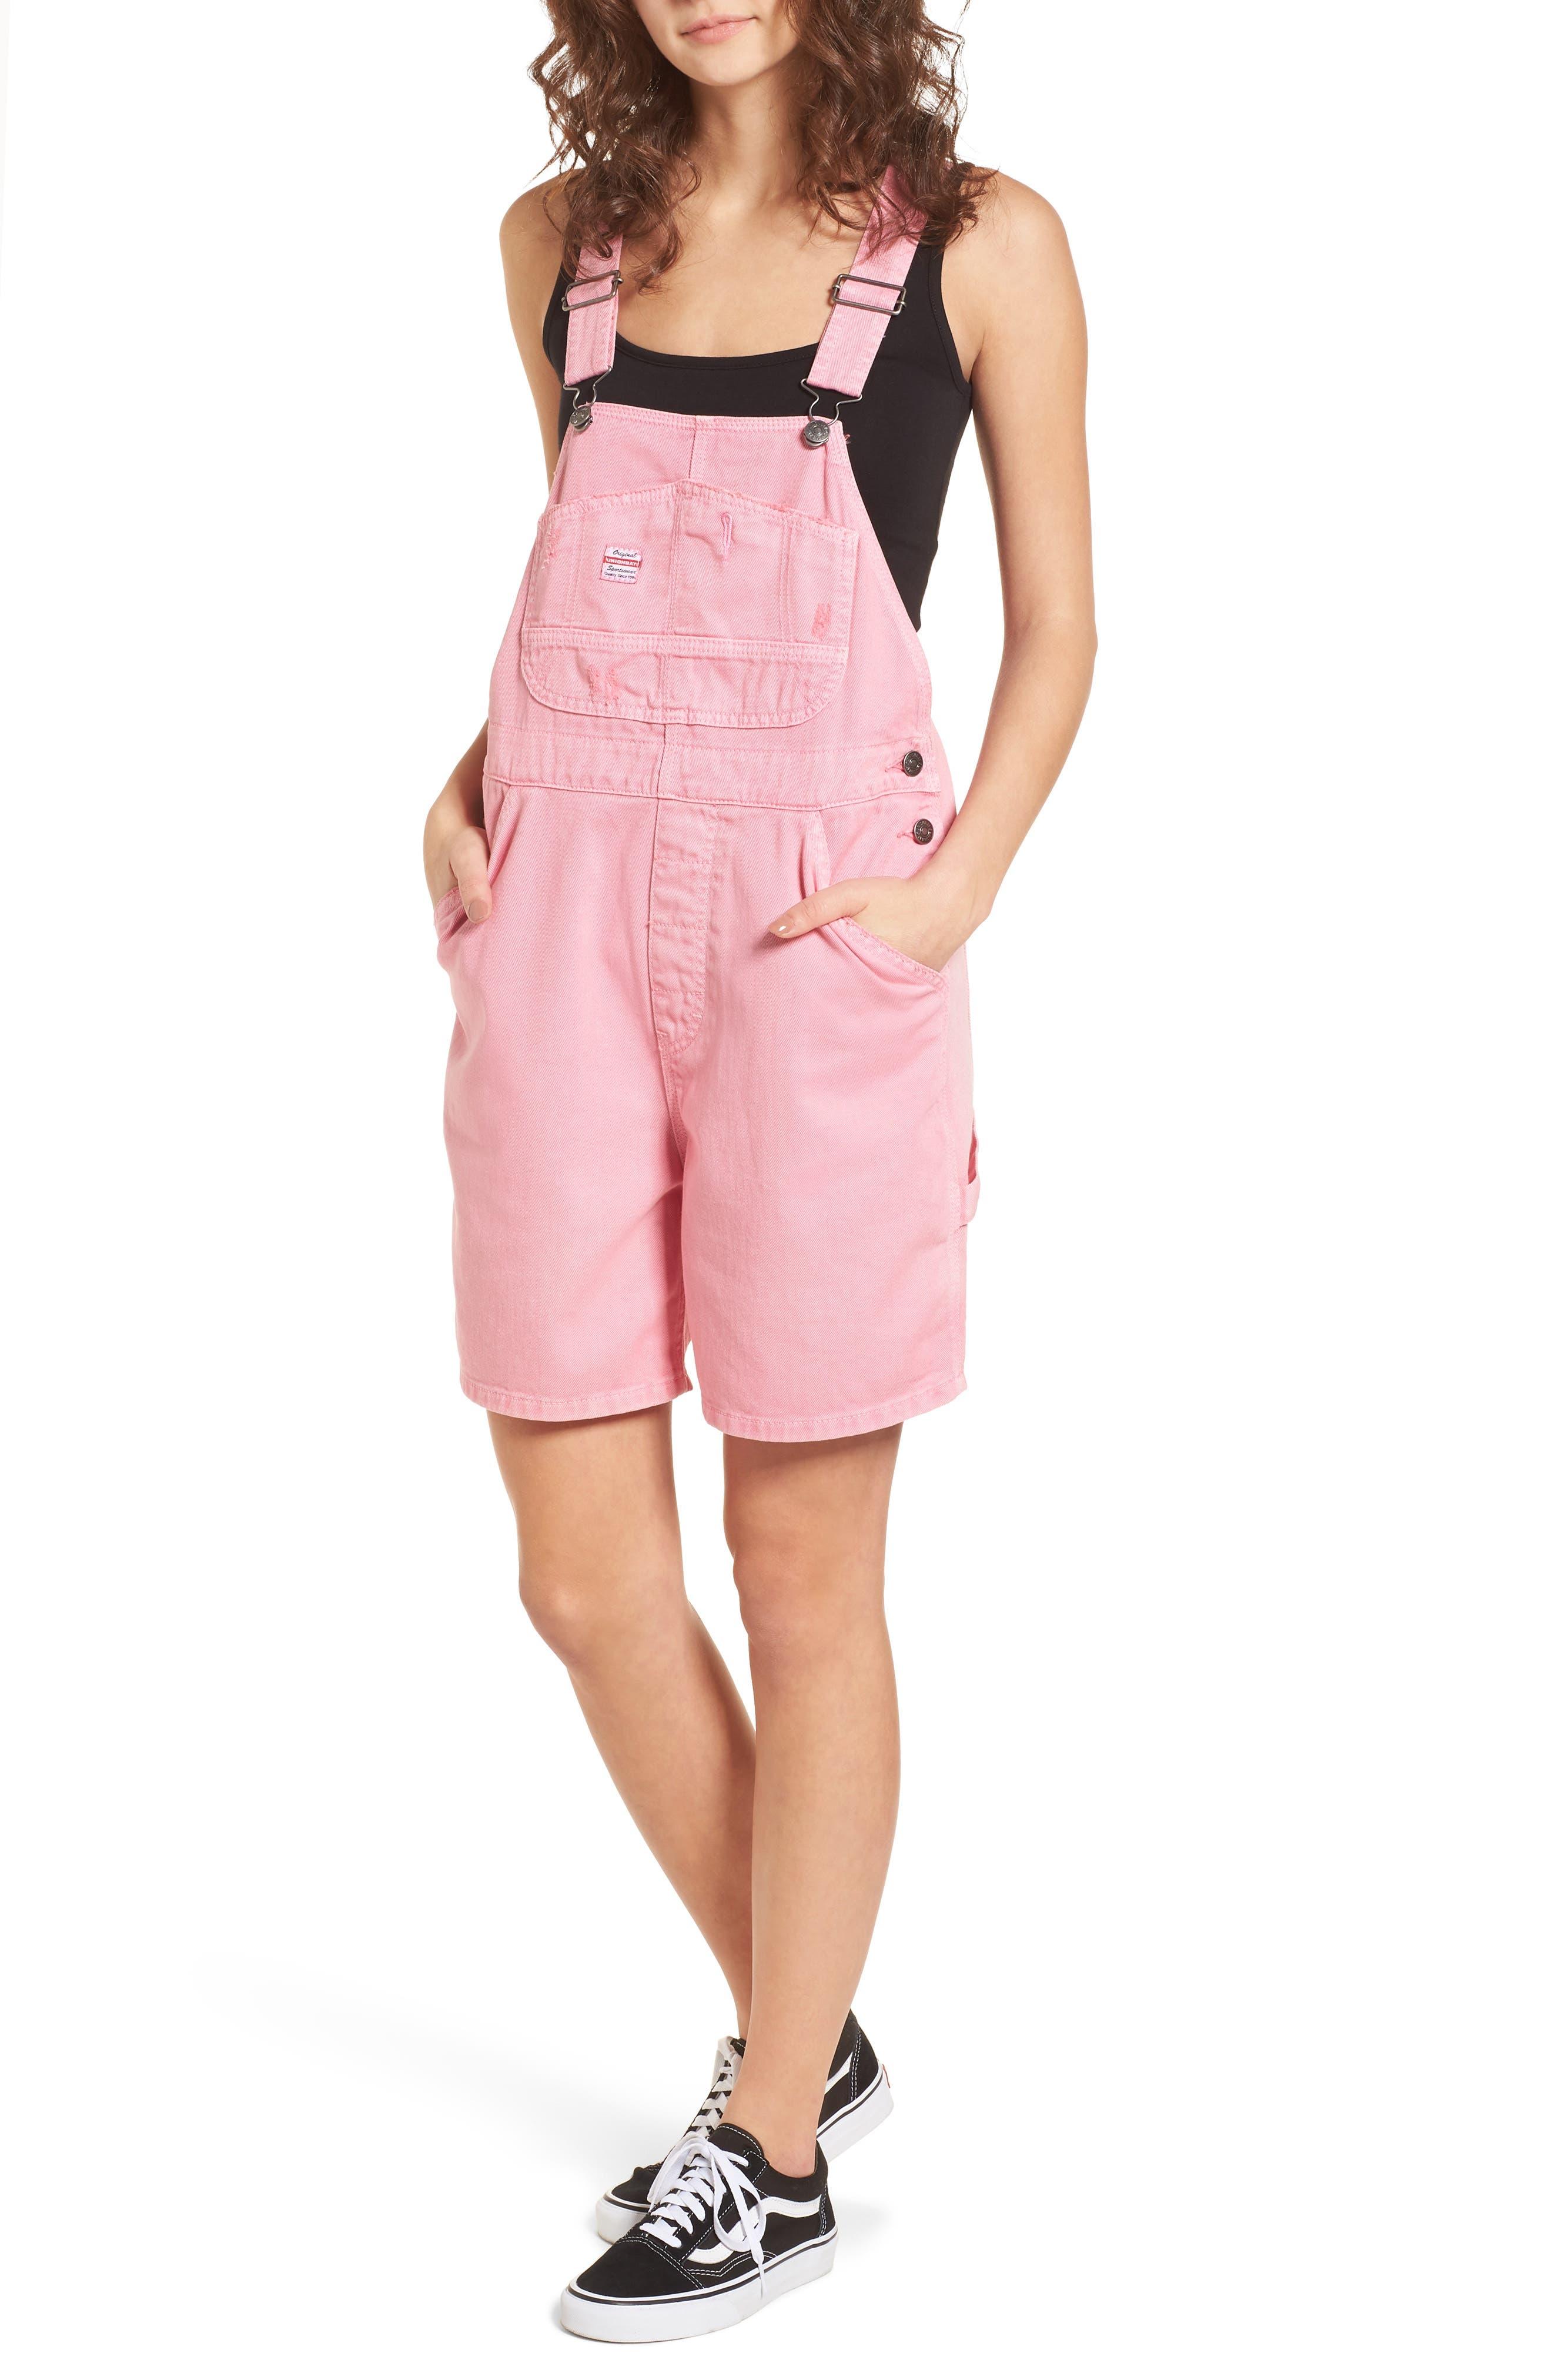 Unionbay Mario Denim Shortalls,                         Main,                         color, Popsicle Pink